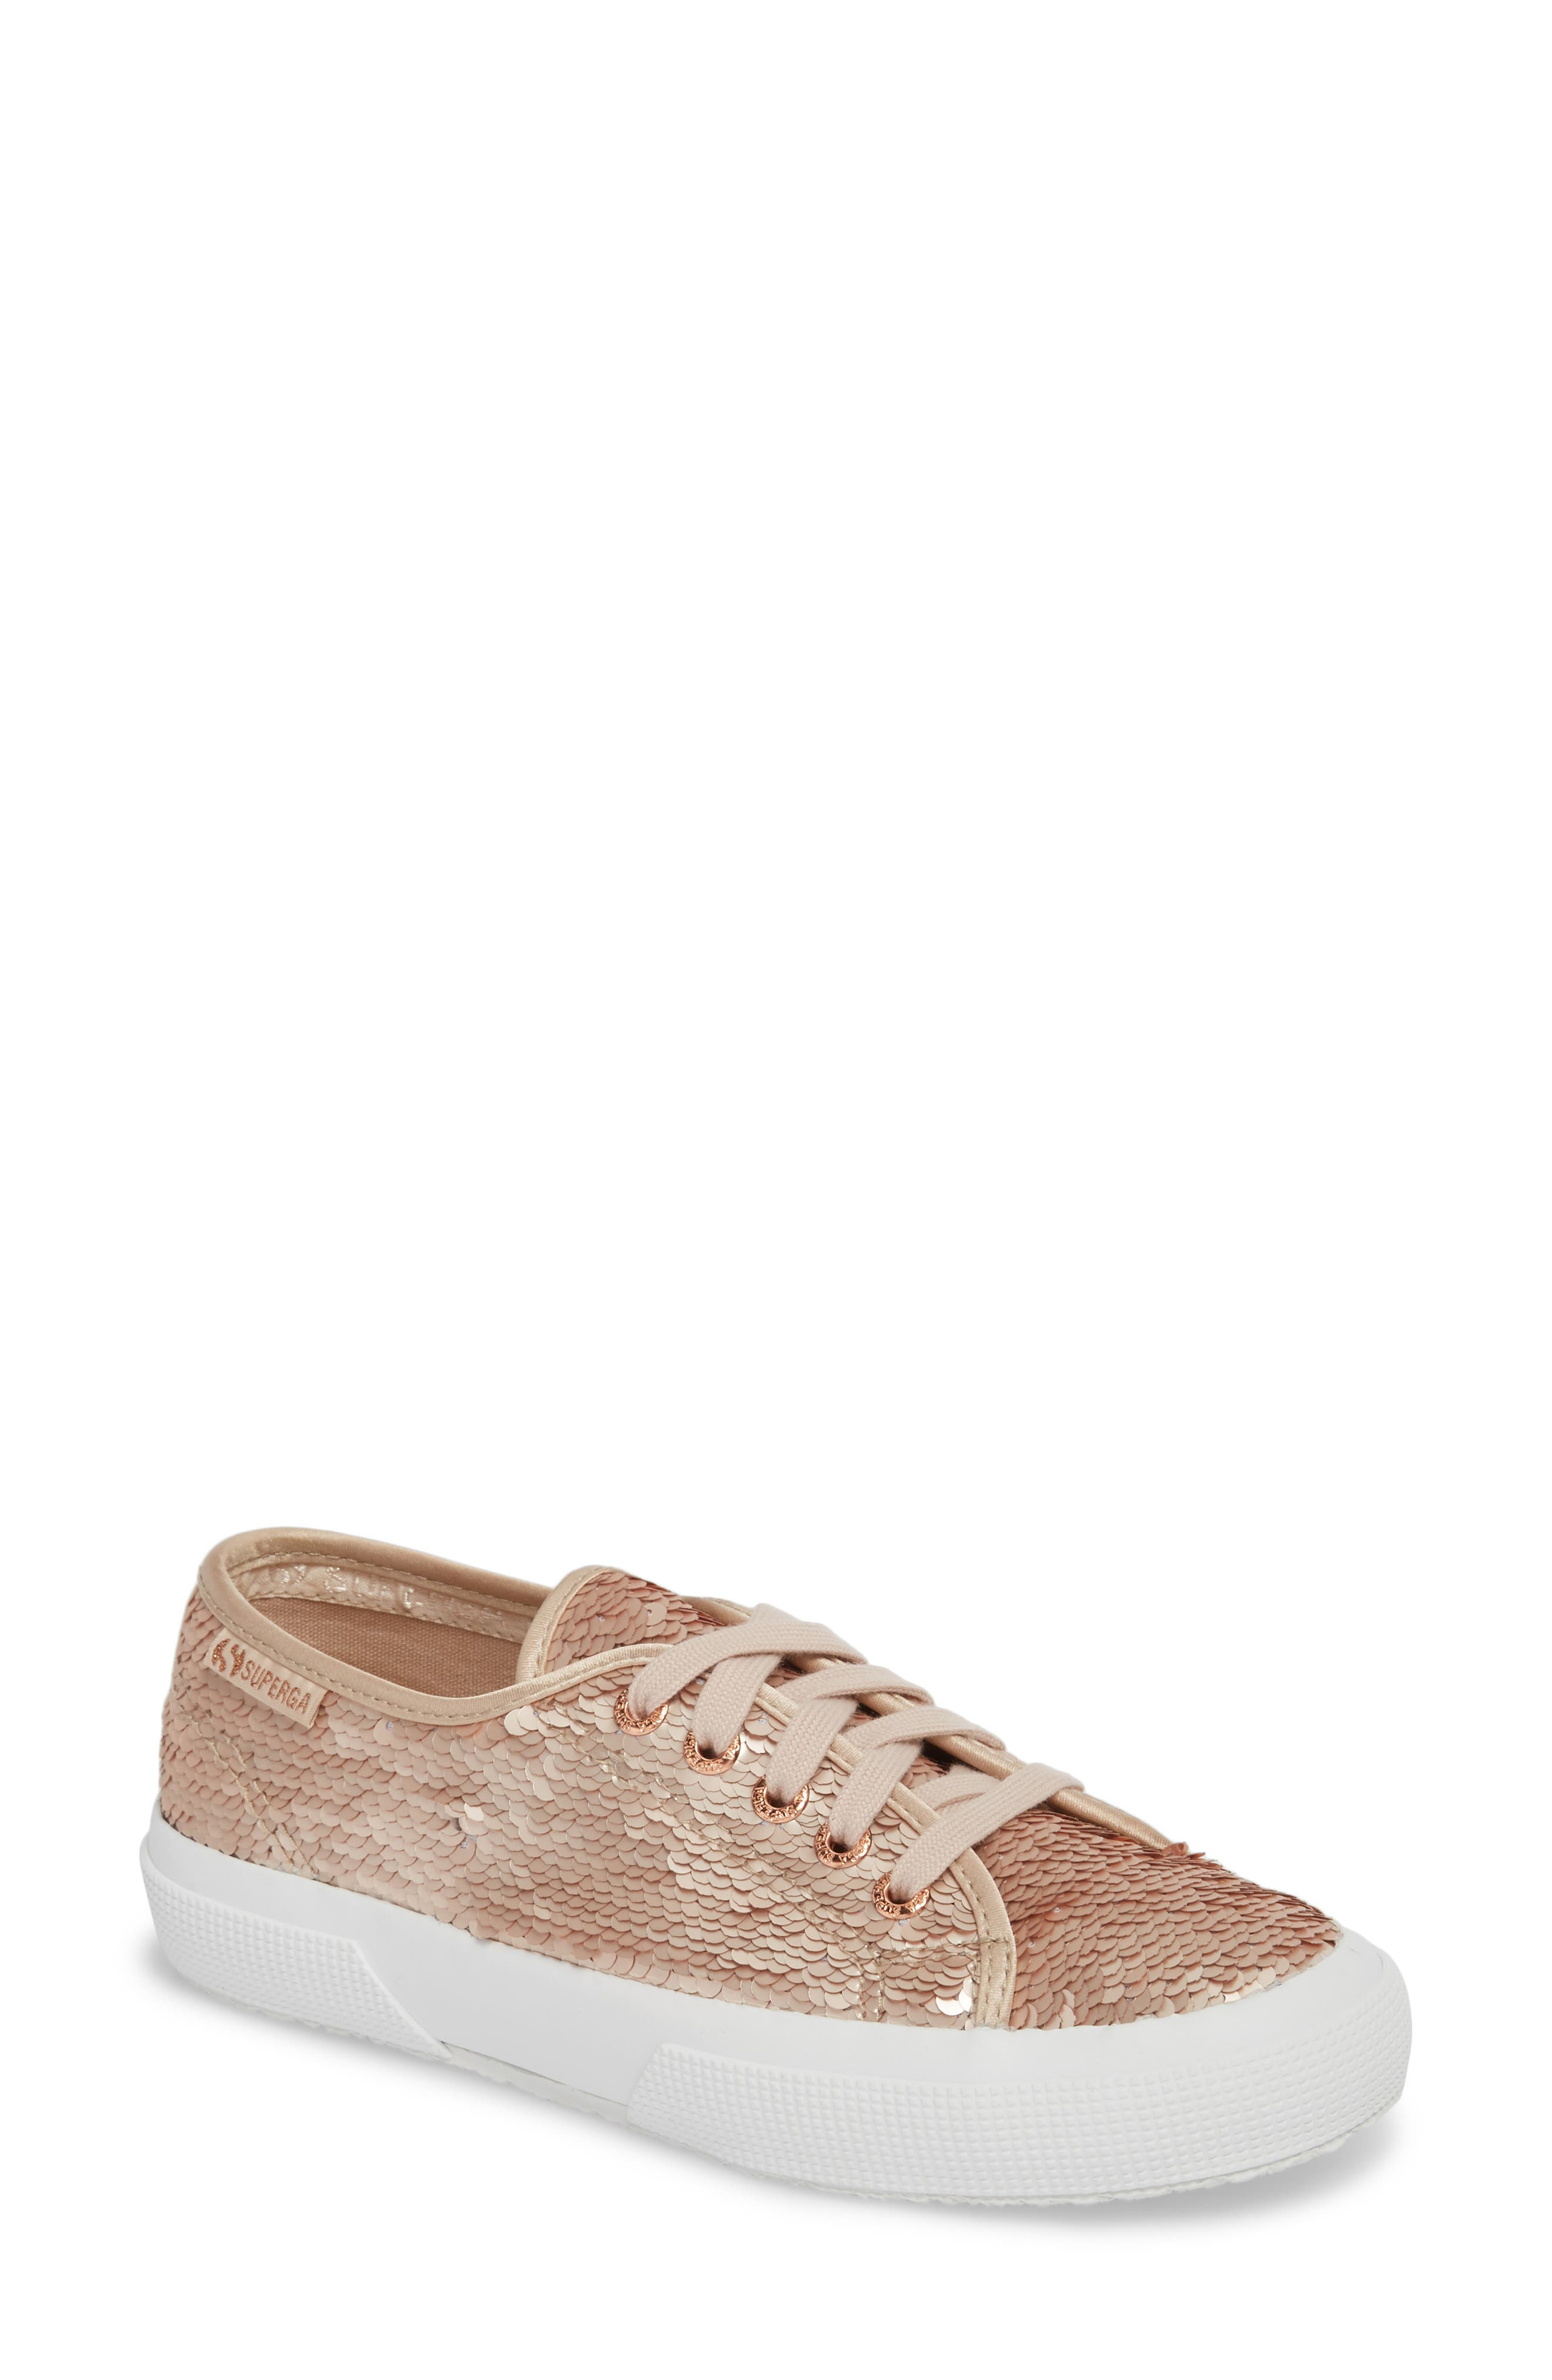 2750 Pairidescent Low Top Sneaker,                         Main,                         color, 687